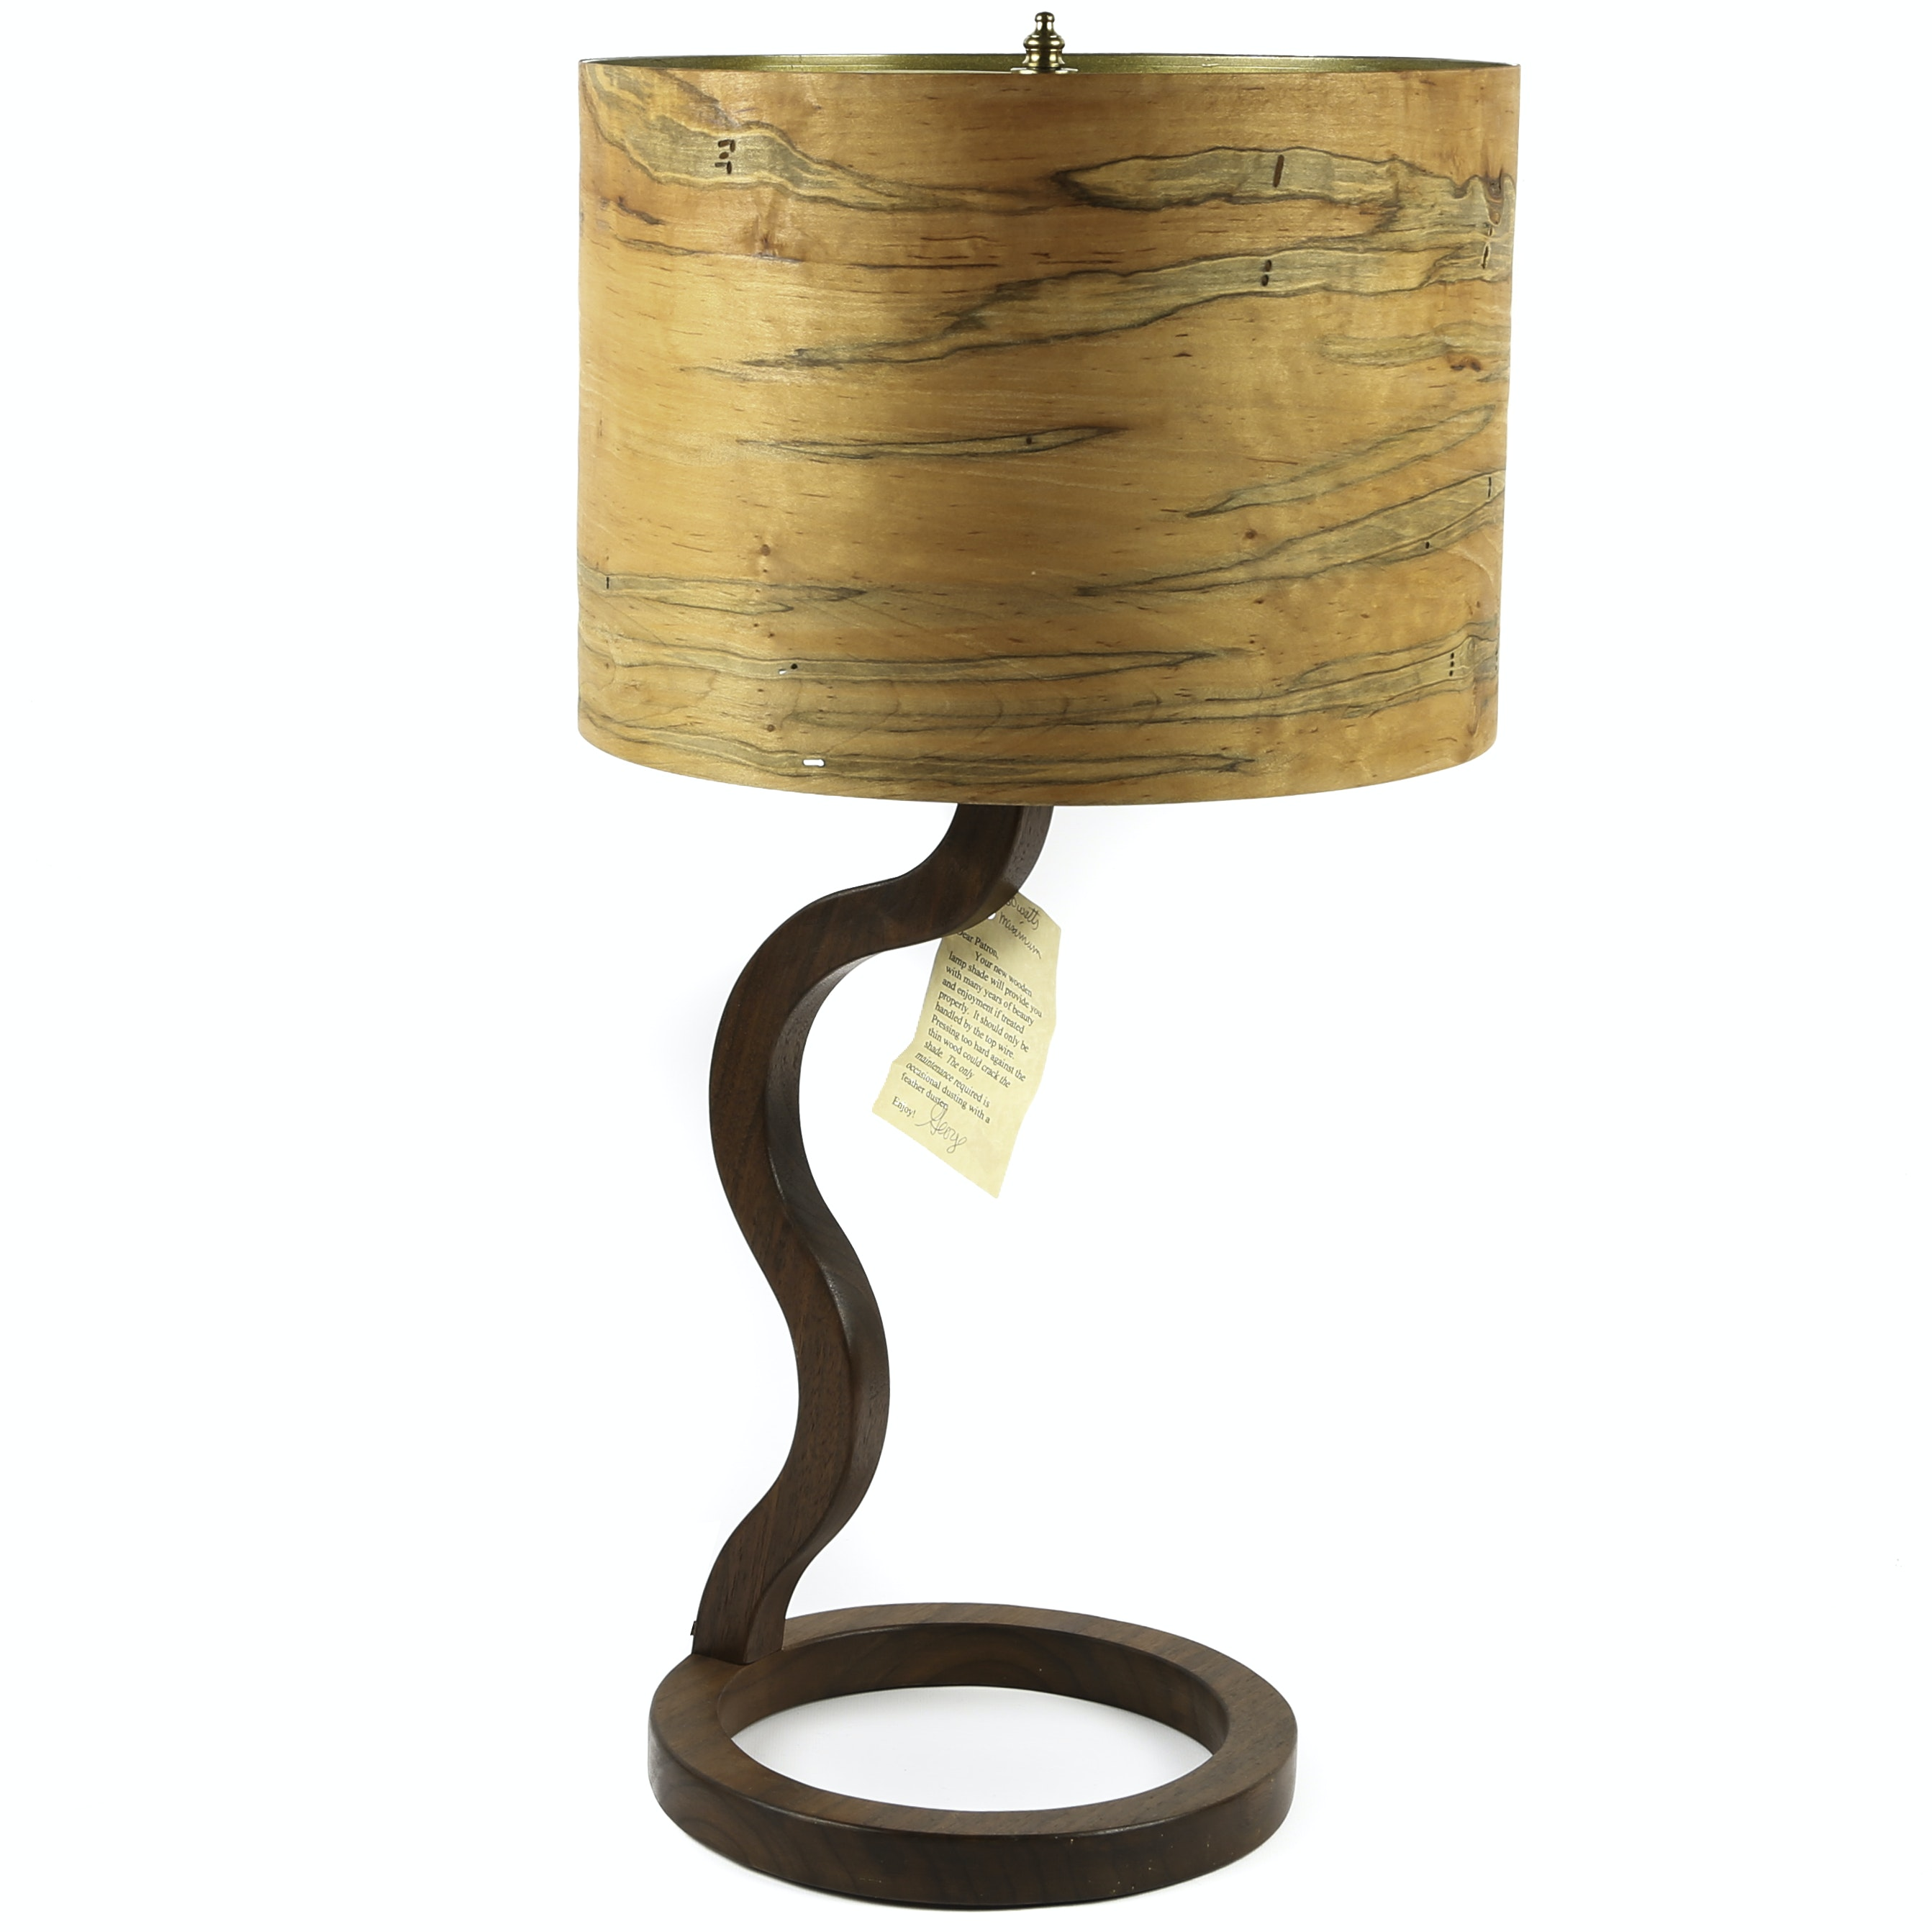 George Biersdorf Handcrafted Walnut Table Lamp